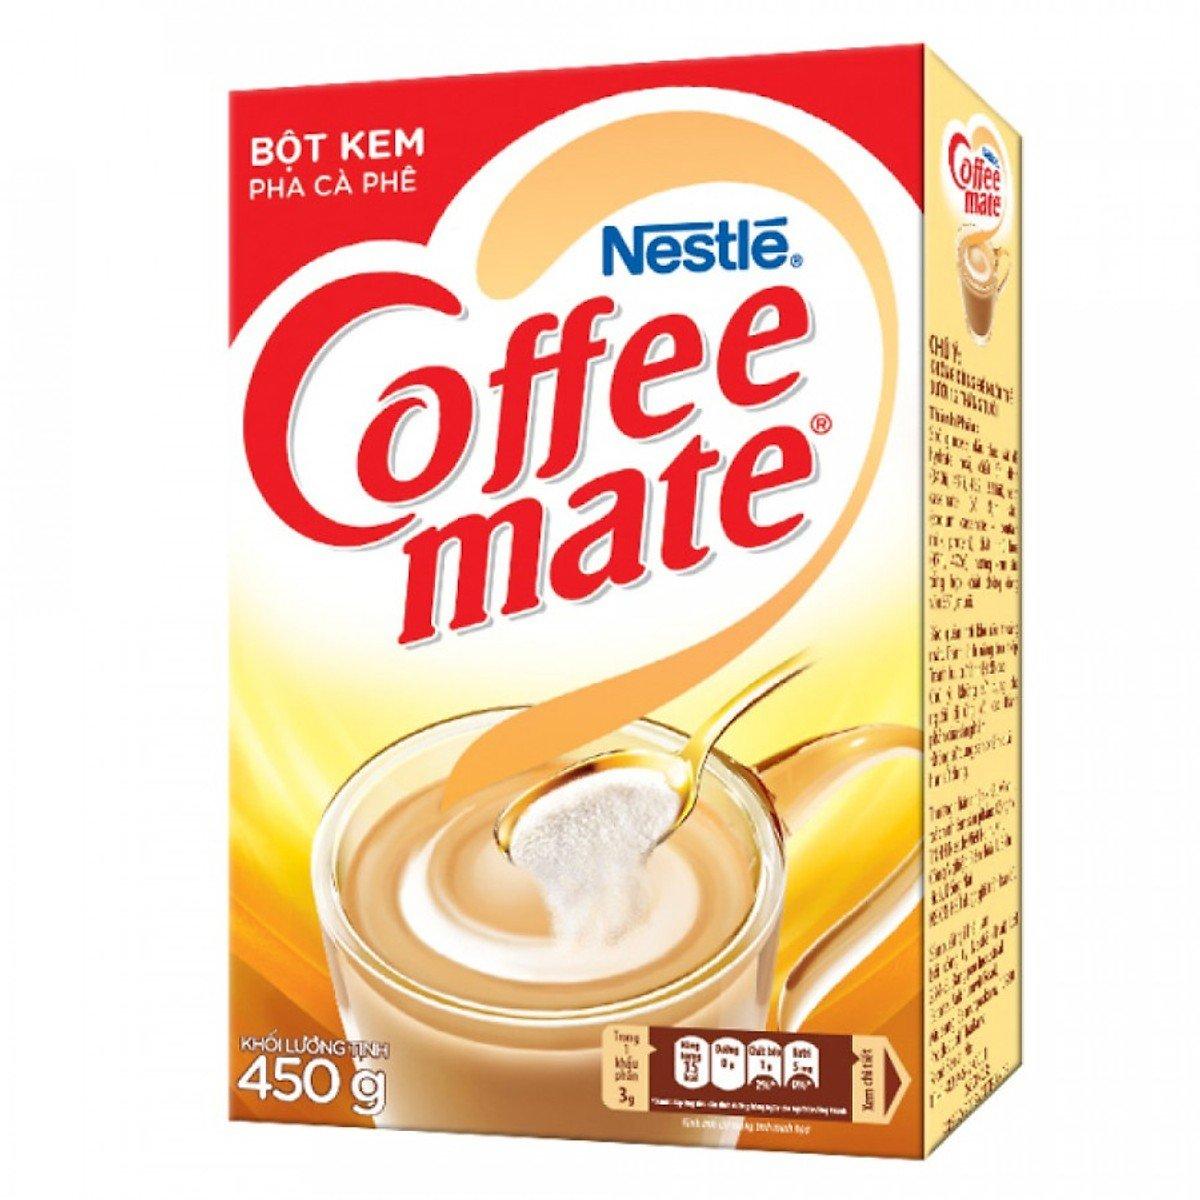 Nescafé Coffee mate